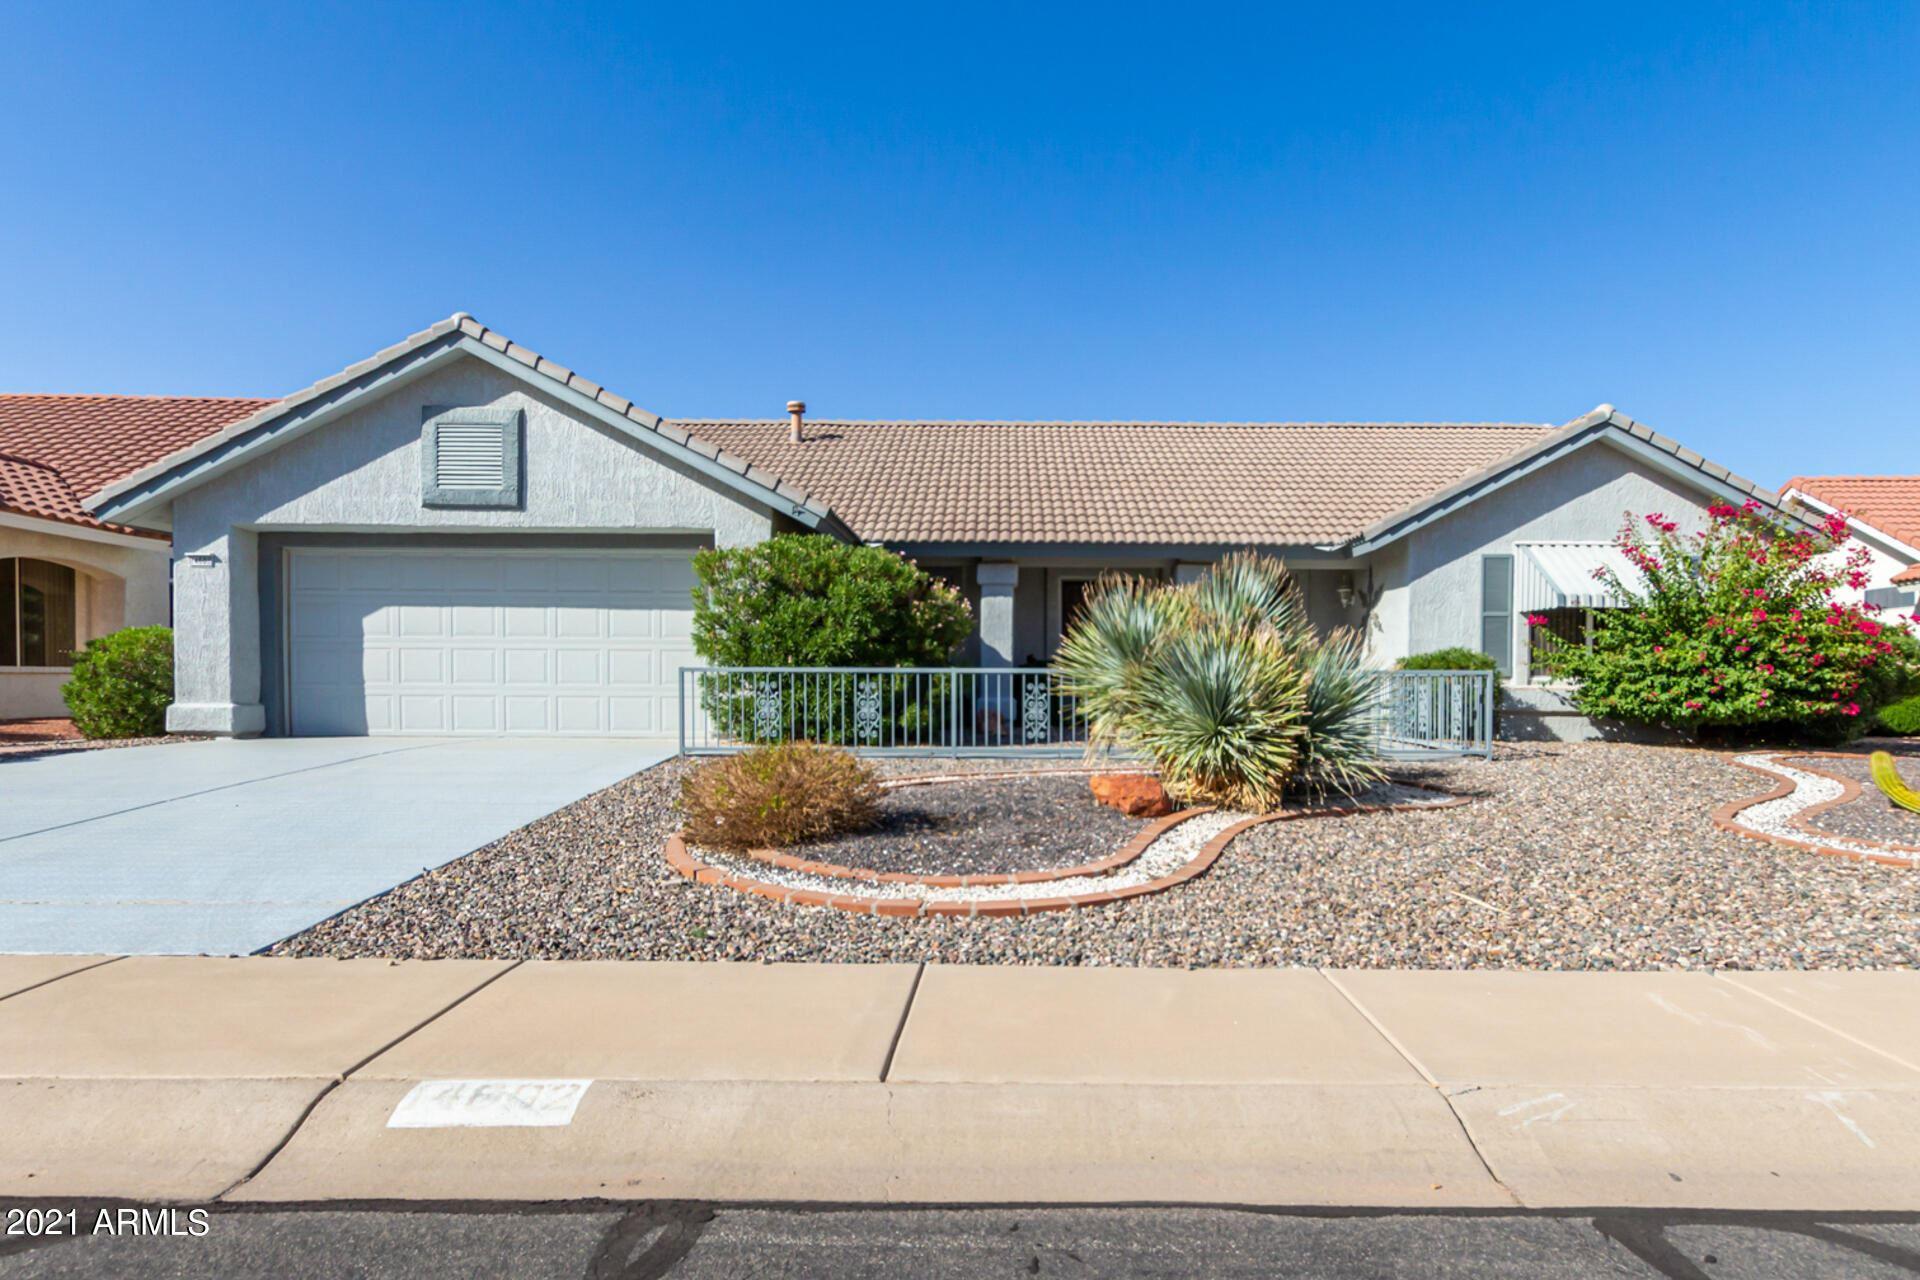 Photo of 14602 W HURON Drive, Sun City West, AZ 85375 (MLS # 6306683)